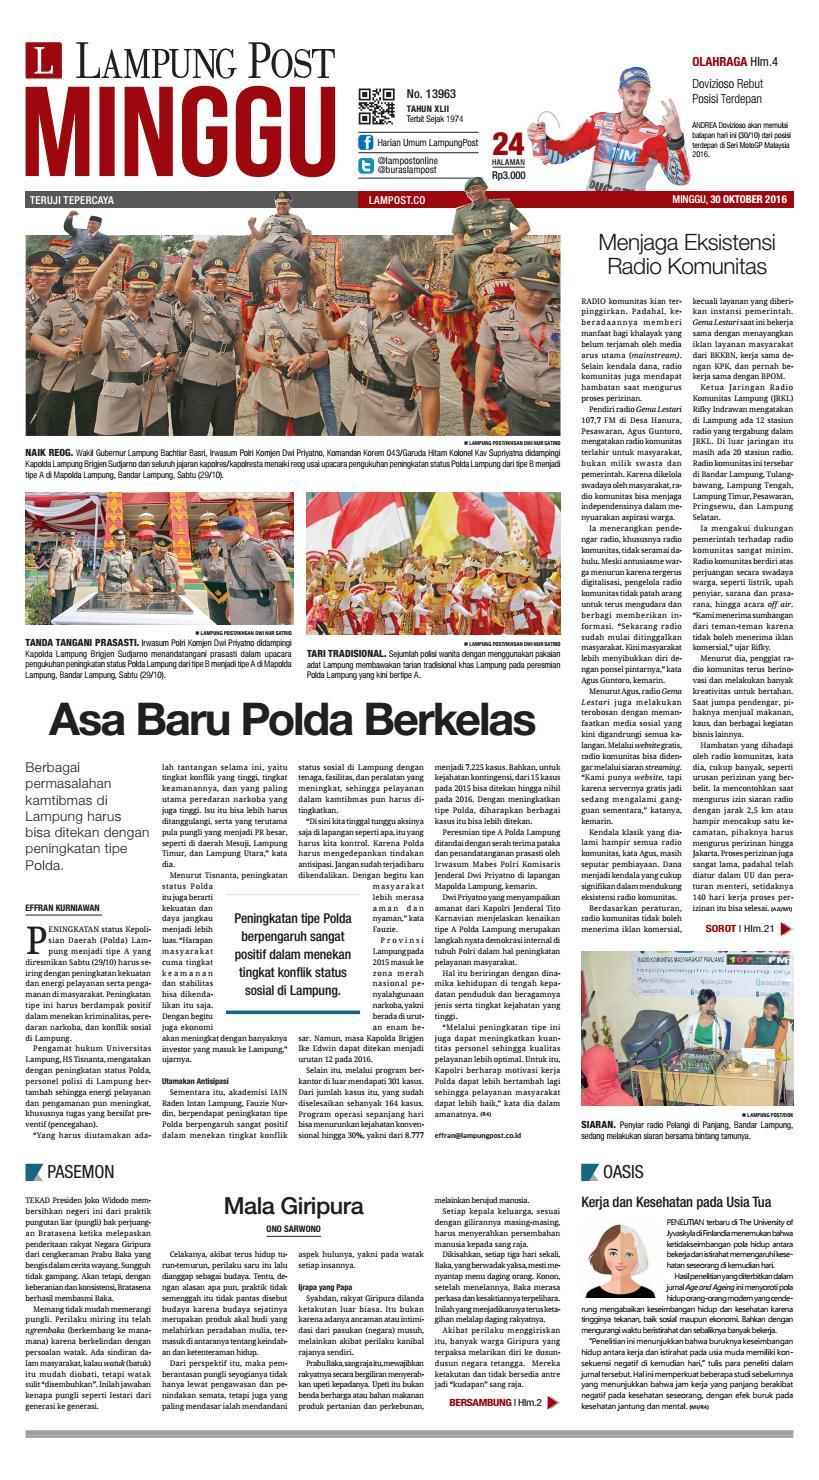 Lampung Post Minggu 30 Oktober 2016 By Issuu Produk Ukm Bumn Sulam Usus Pmk